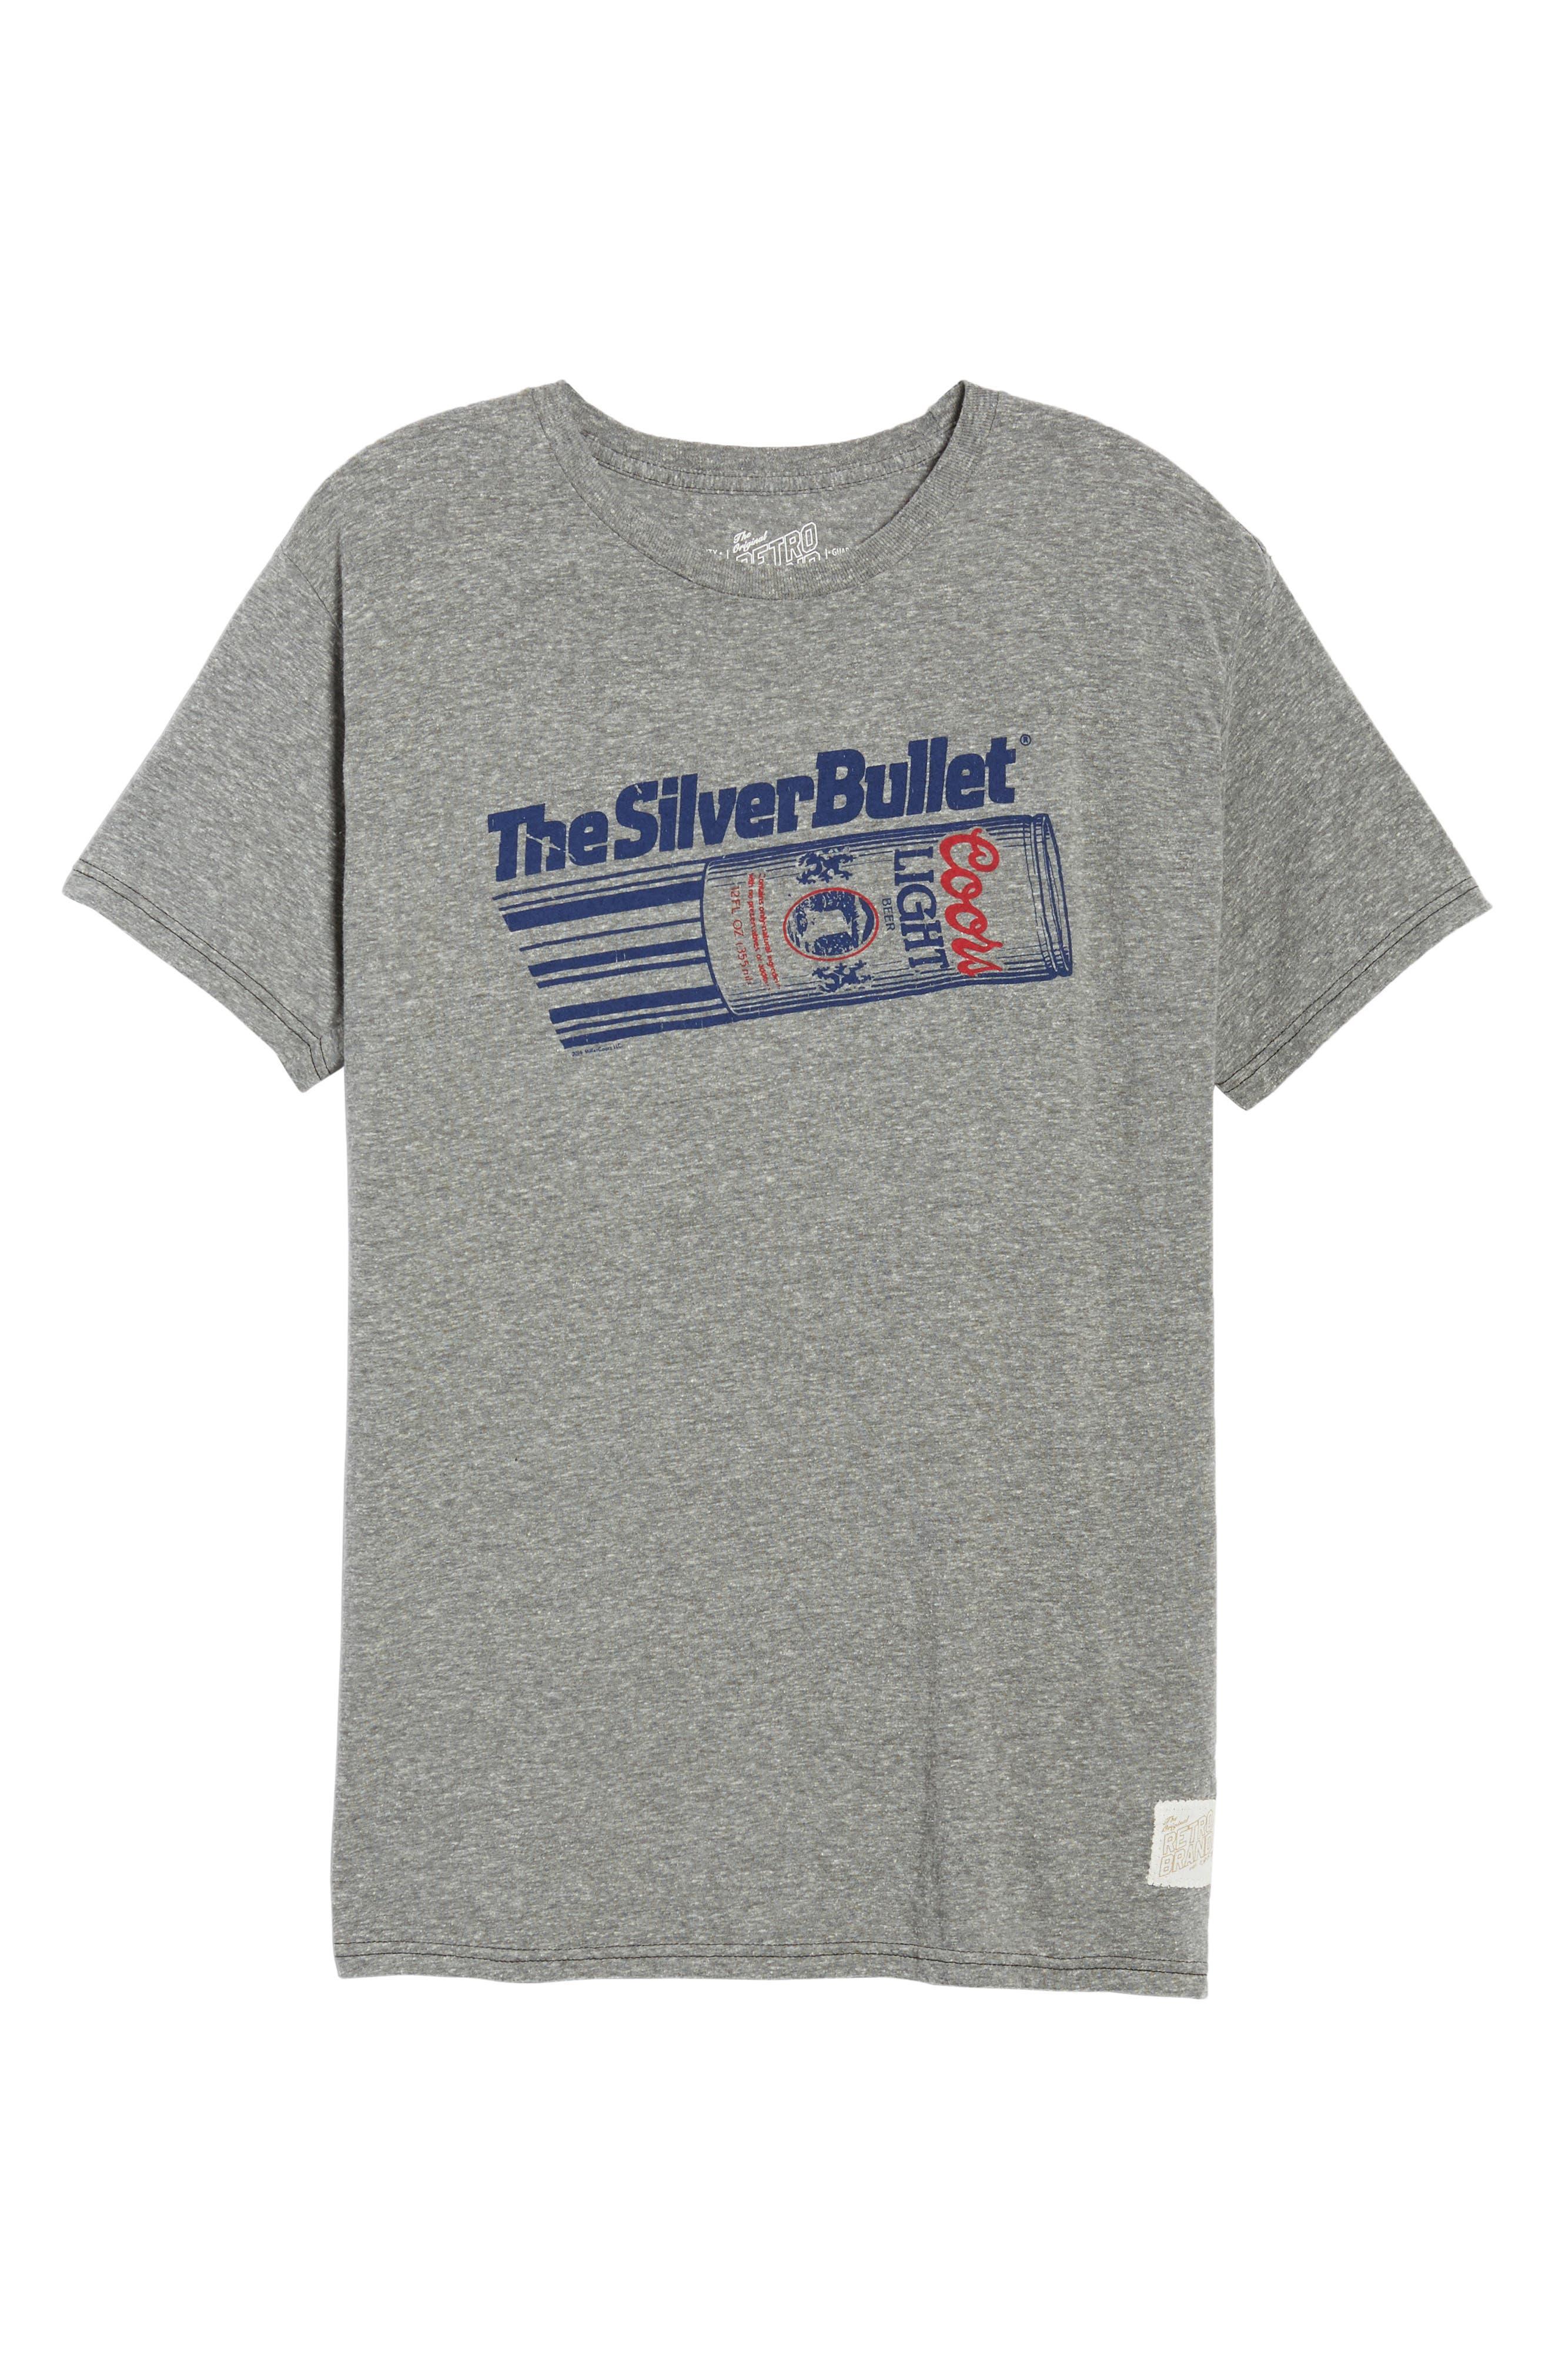 RETRO BRAND,                             Original Retro Brand Silver Bullet Graphic T-Shirt,                             Alternate thumbnail 6, color,                             020